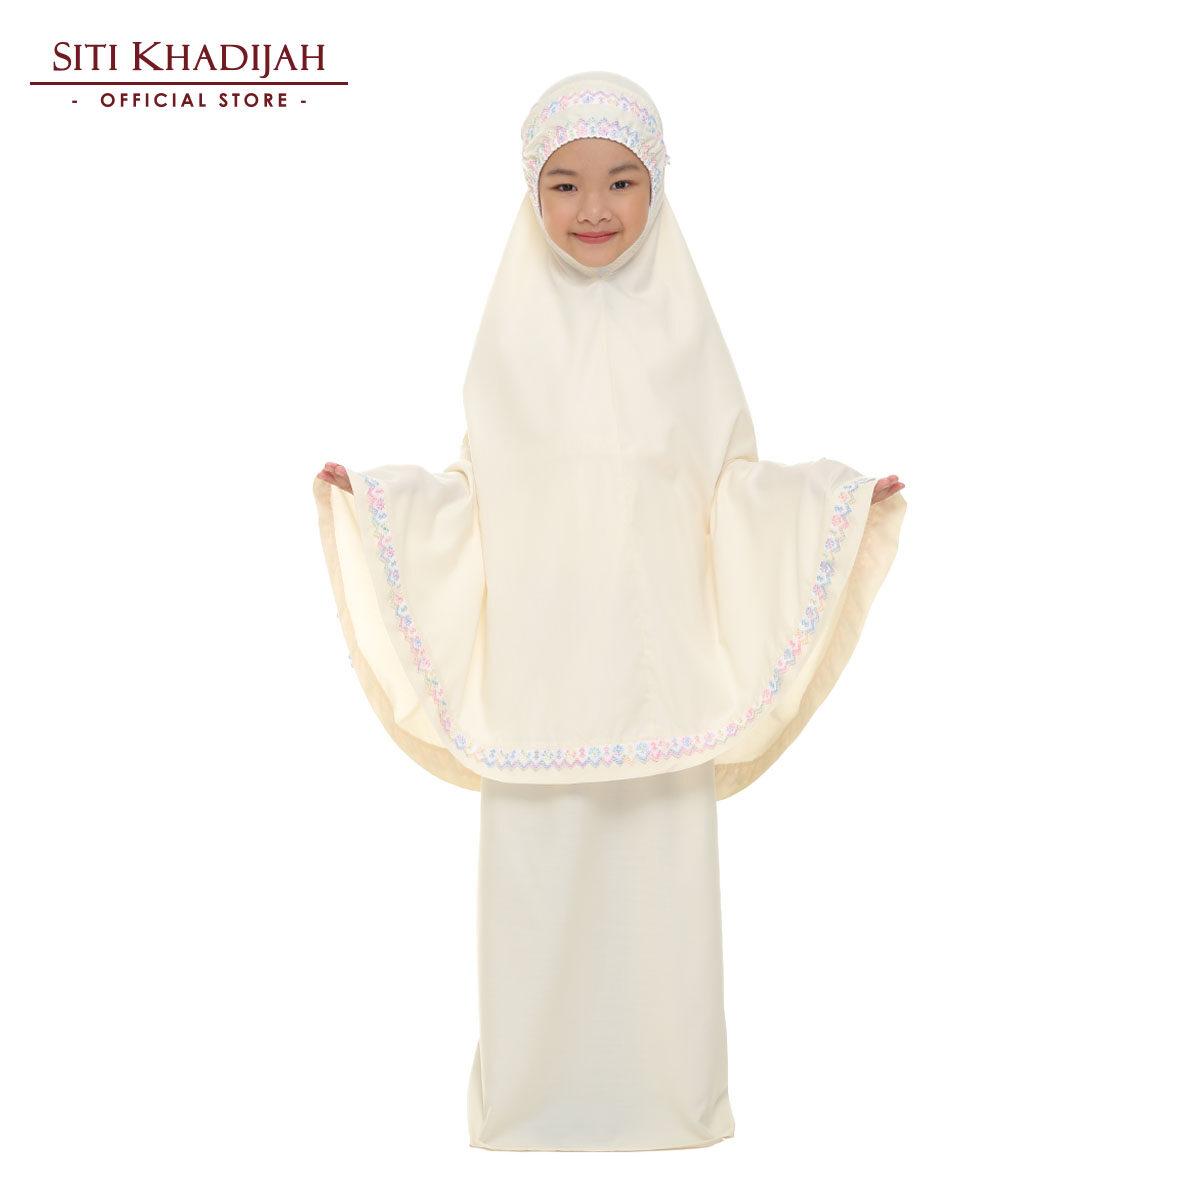 Siti Khadijah Telekung Cilik Samira in Soft Yellow